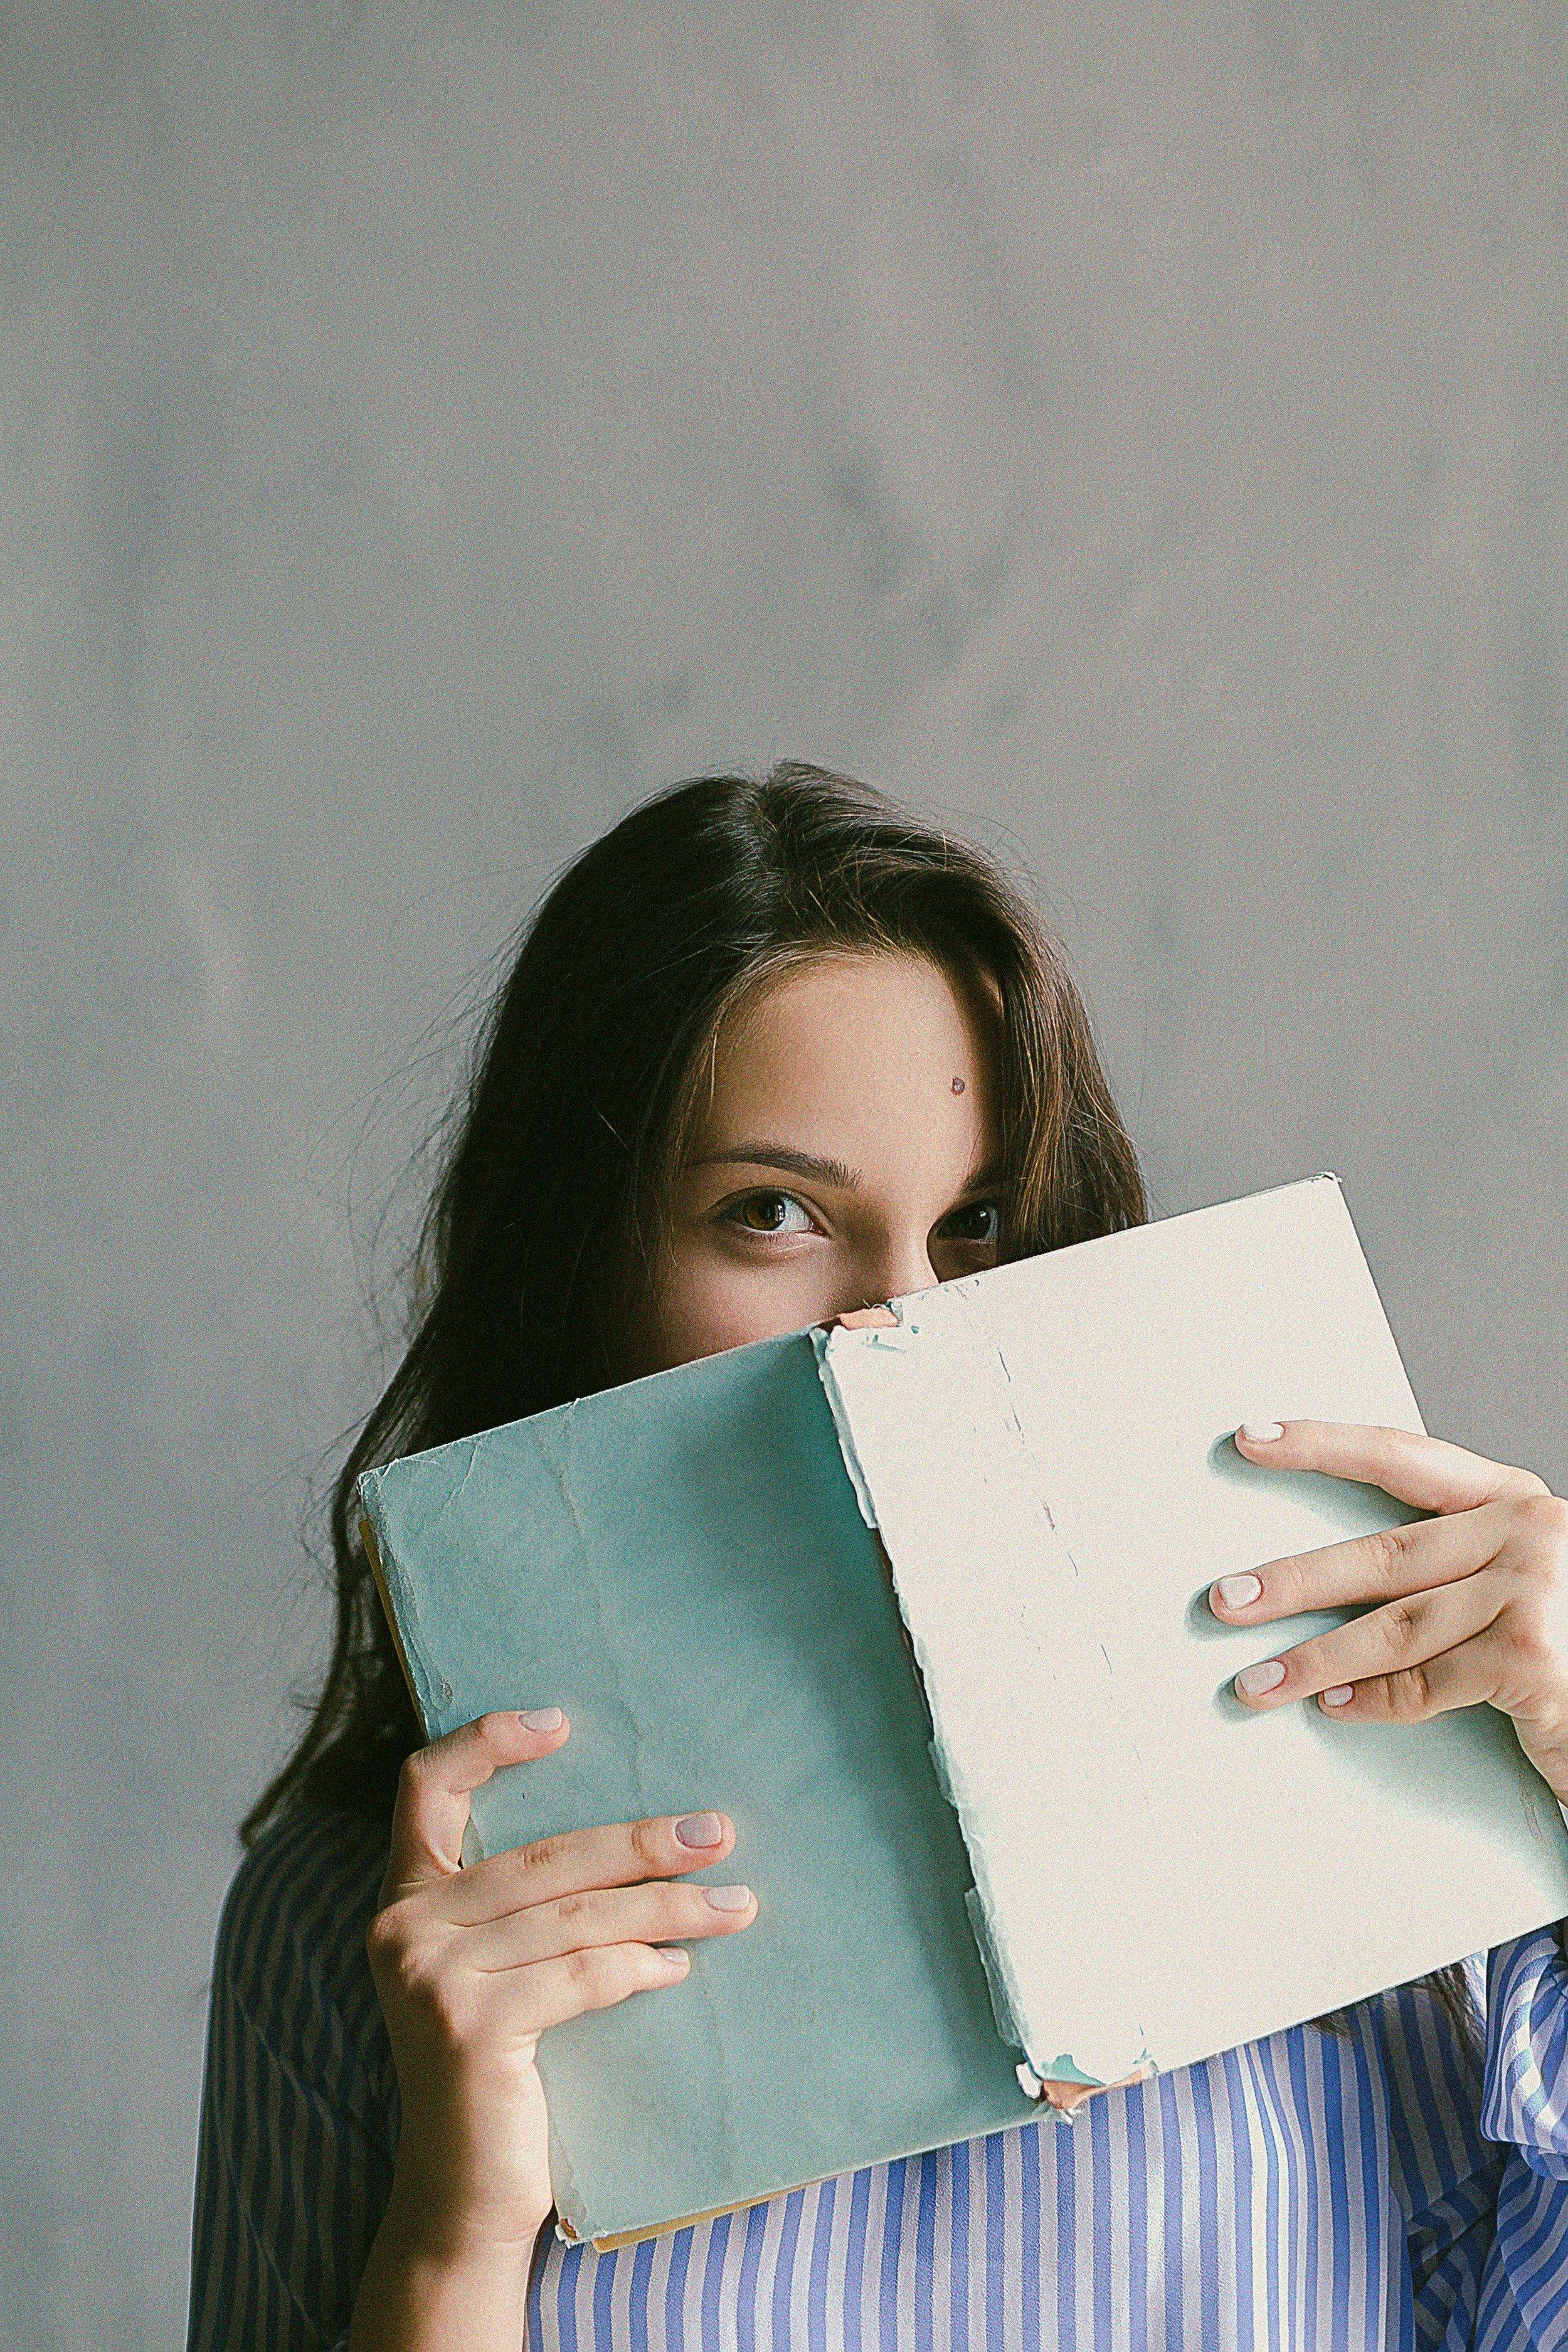 adult-blank-book-698928.jpg